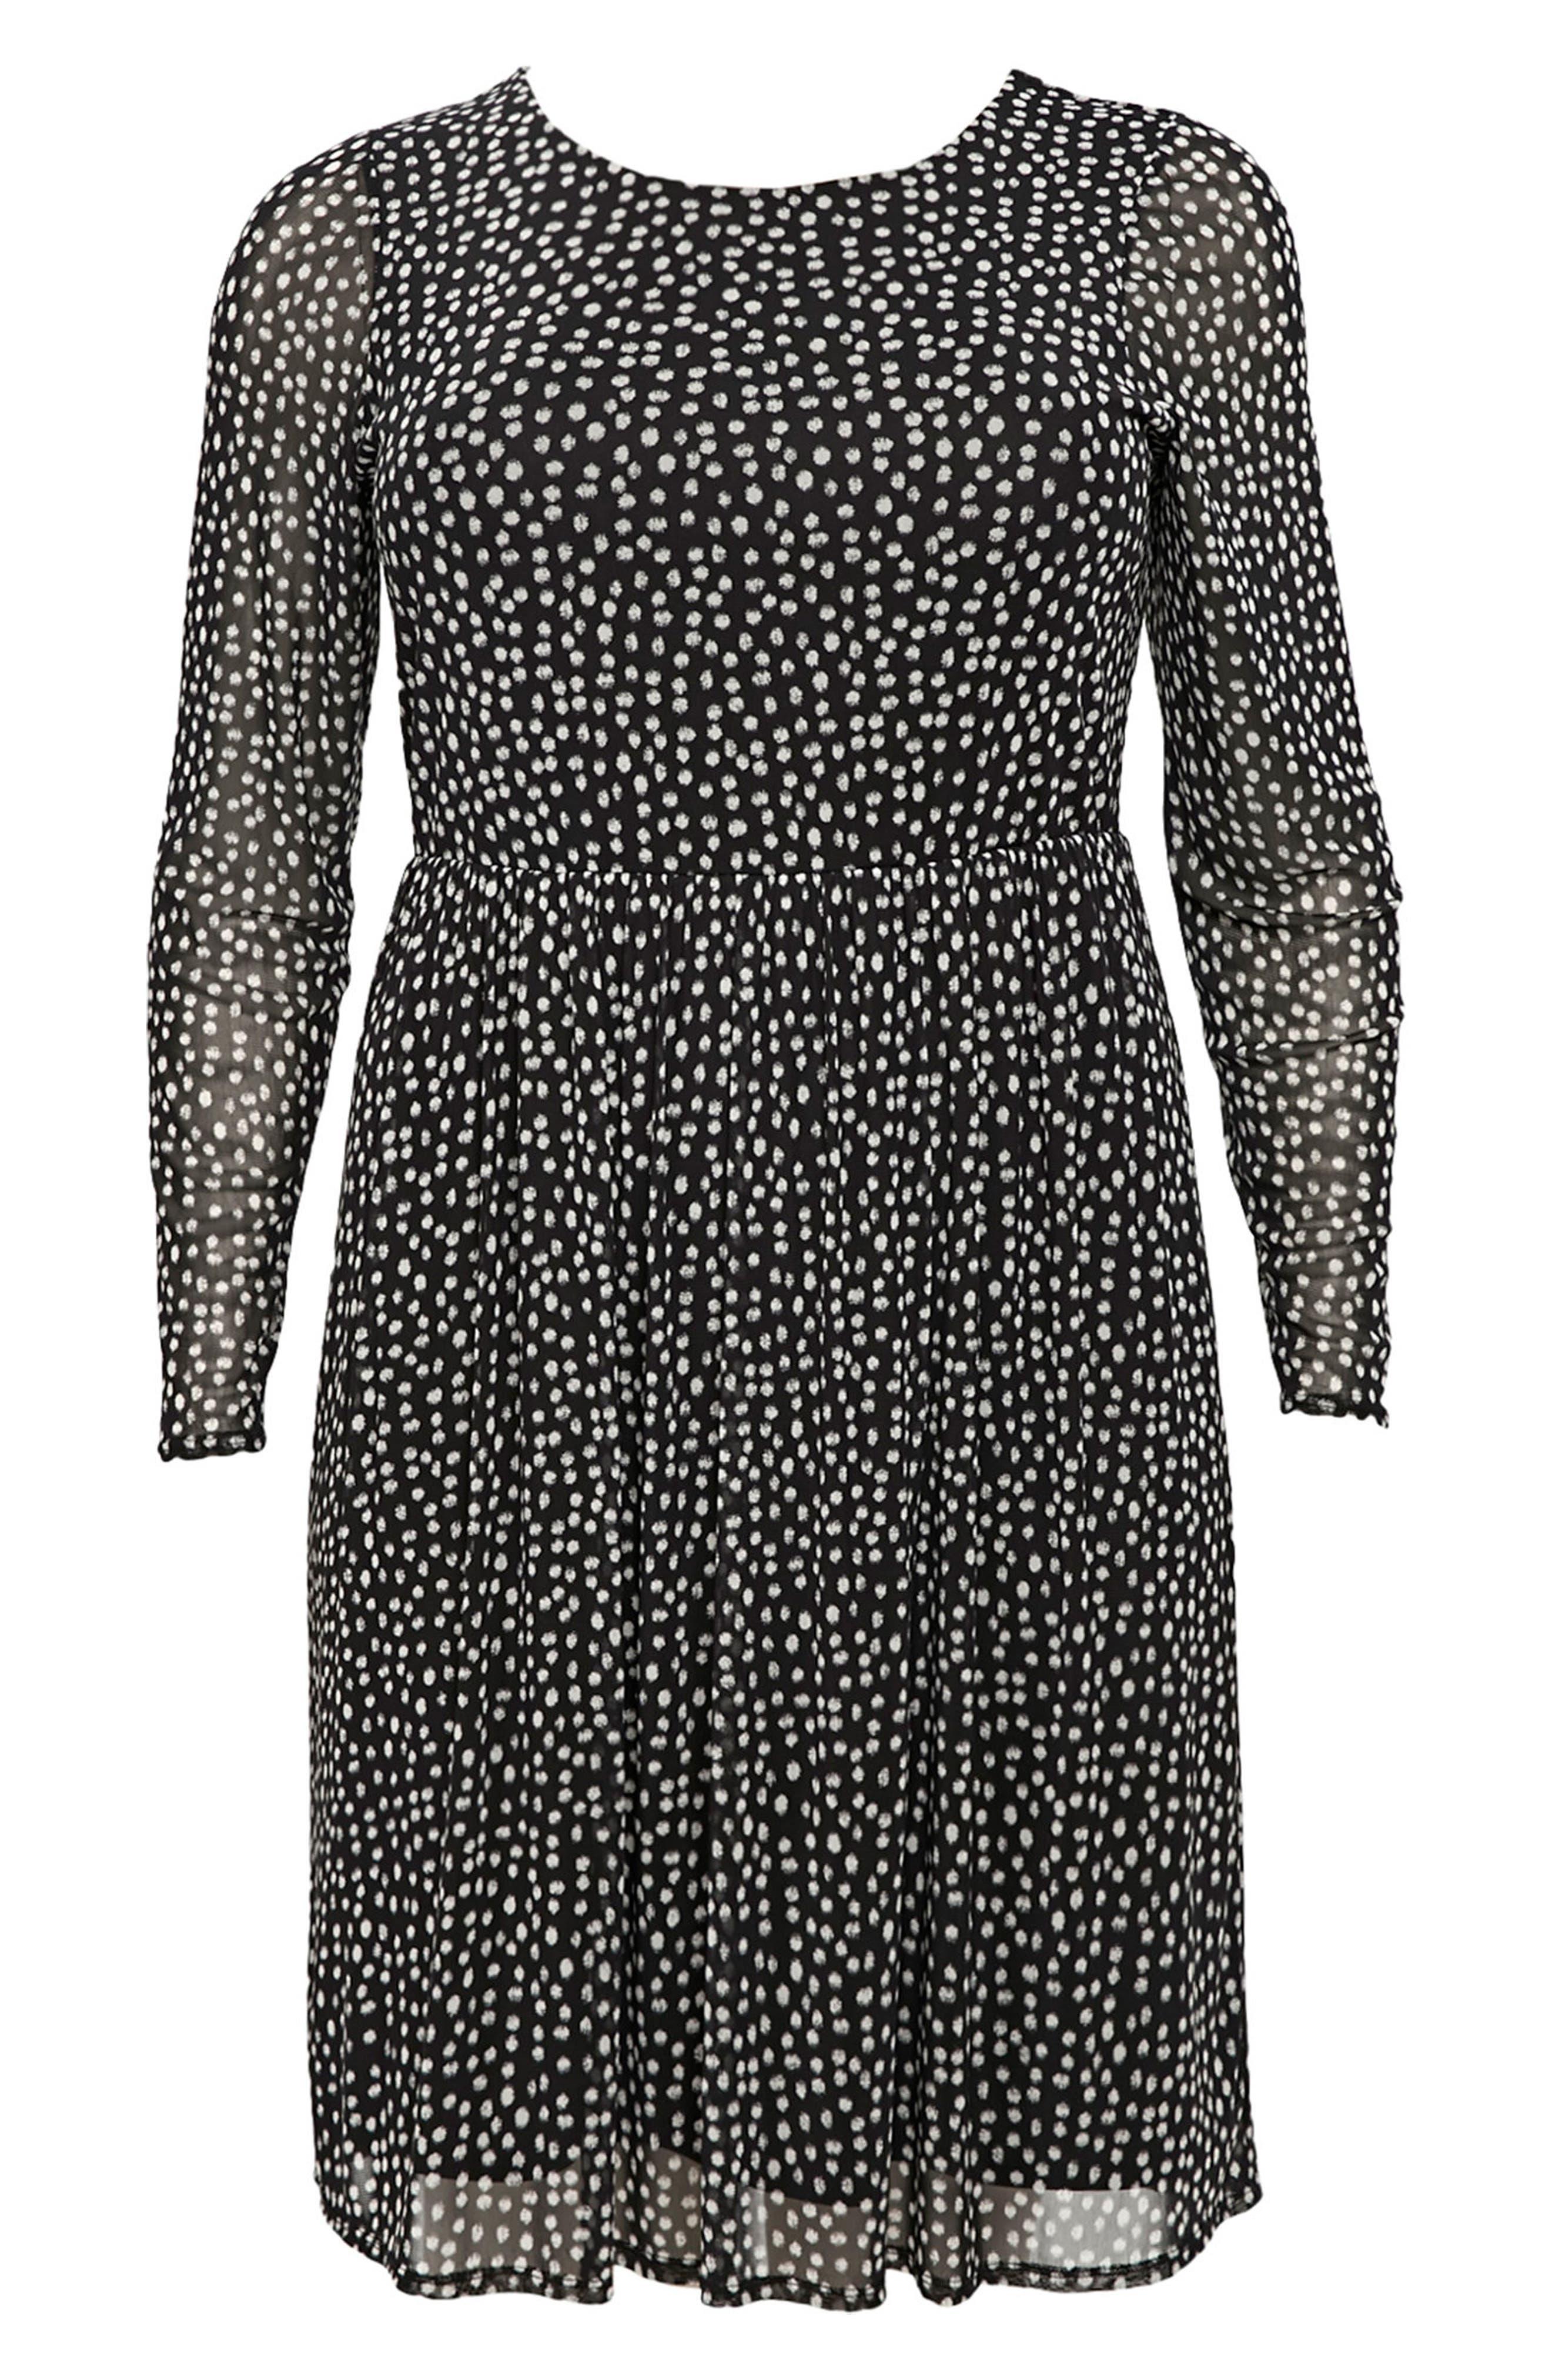 Smudge Print Fit & Flare Dress,                             Alternate thumbnail 4, color,                             Black